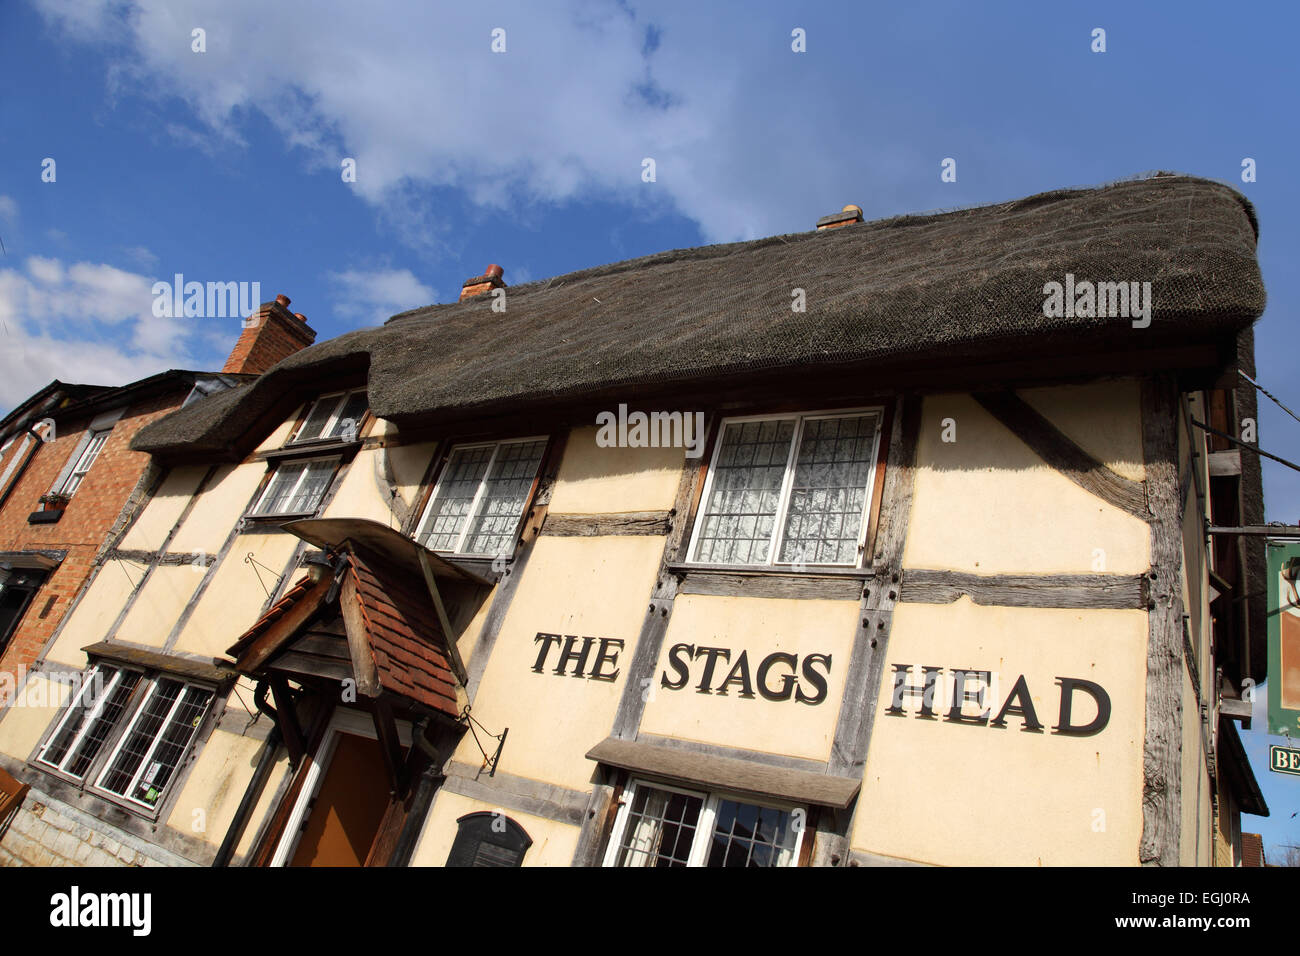 The Stags Head, a rural village pub in Wellesbourne, Warwickshire UK - Stock Image